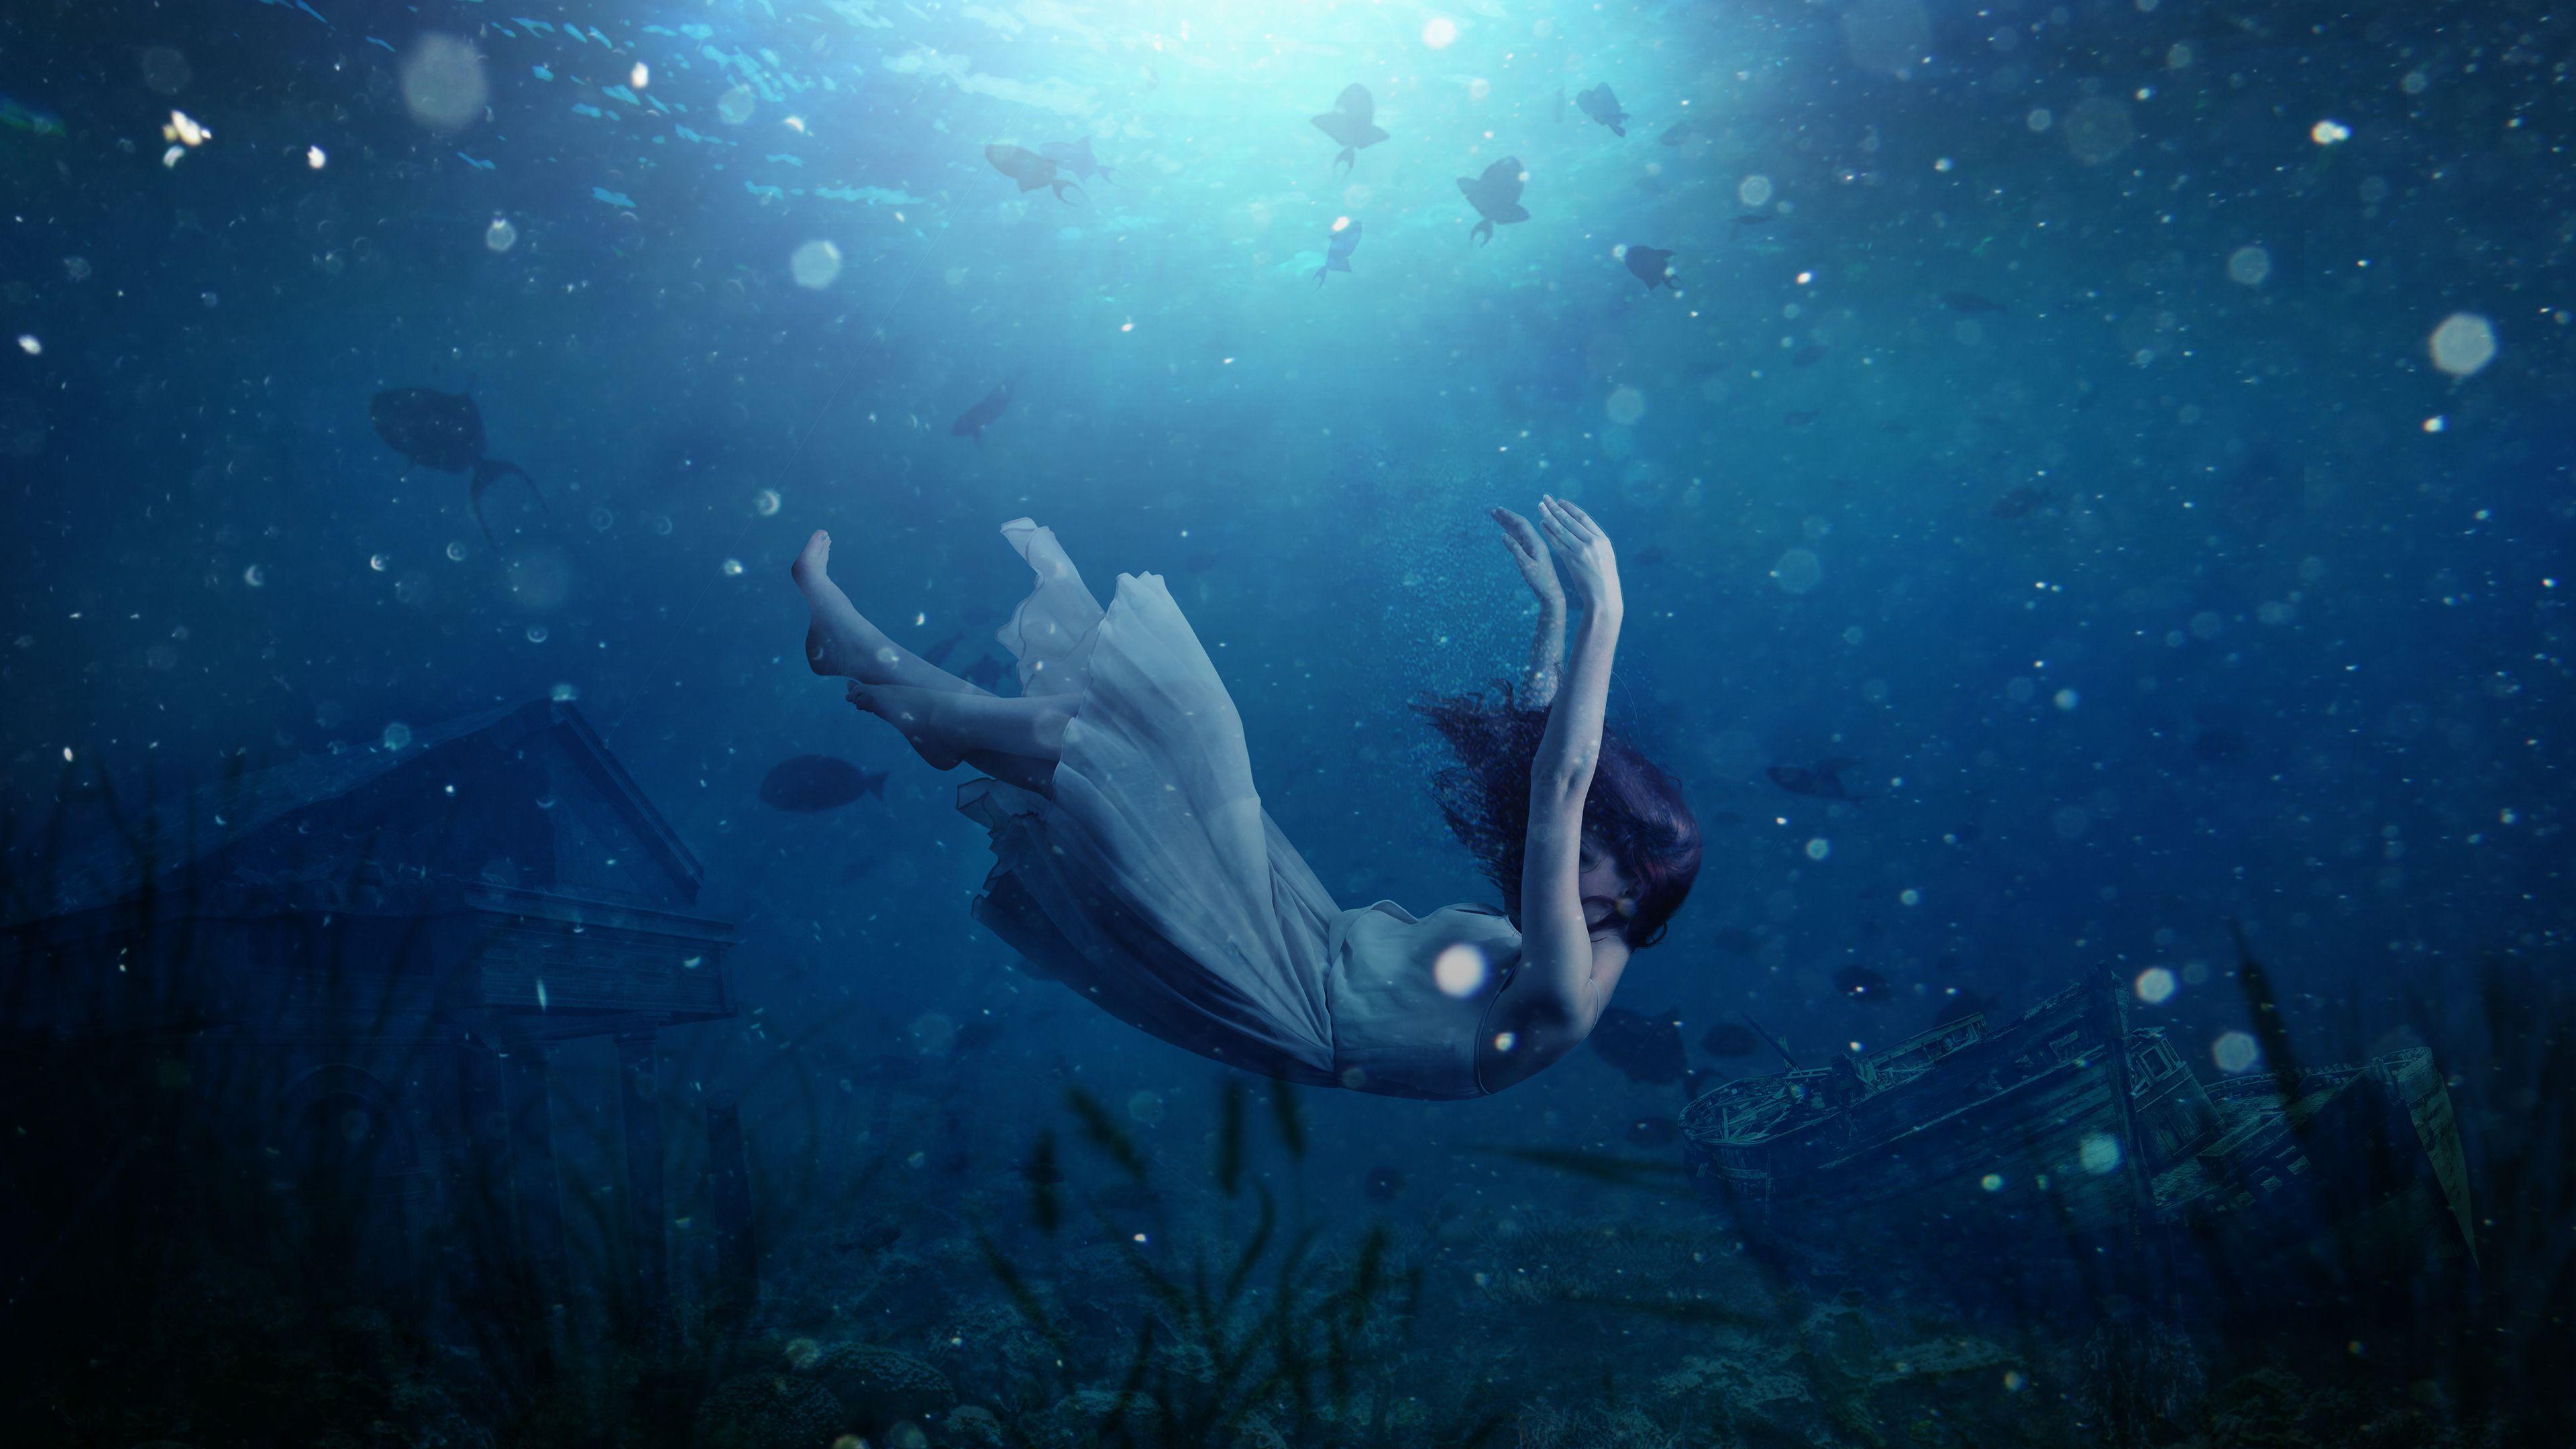 Girl Underwater Dream 4k Blackberry Playbook Apple Ipad 1